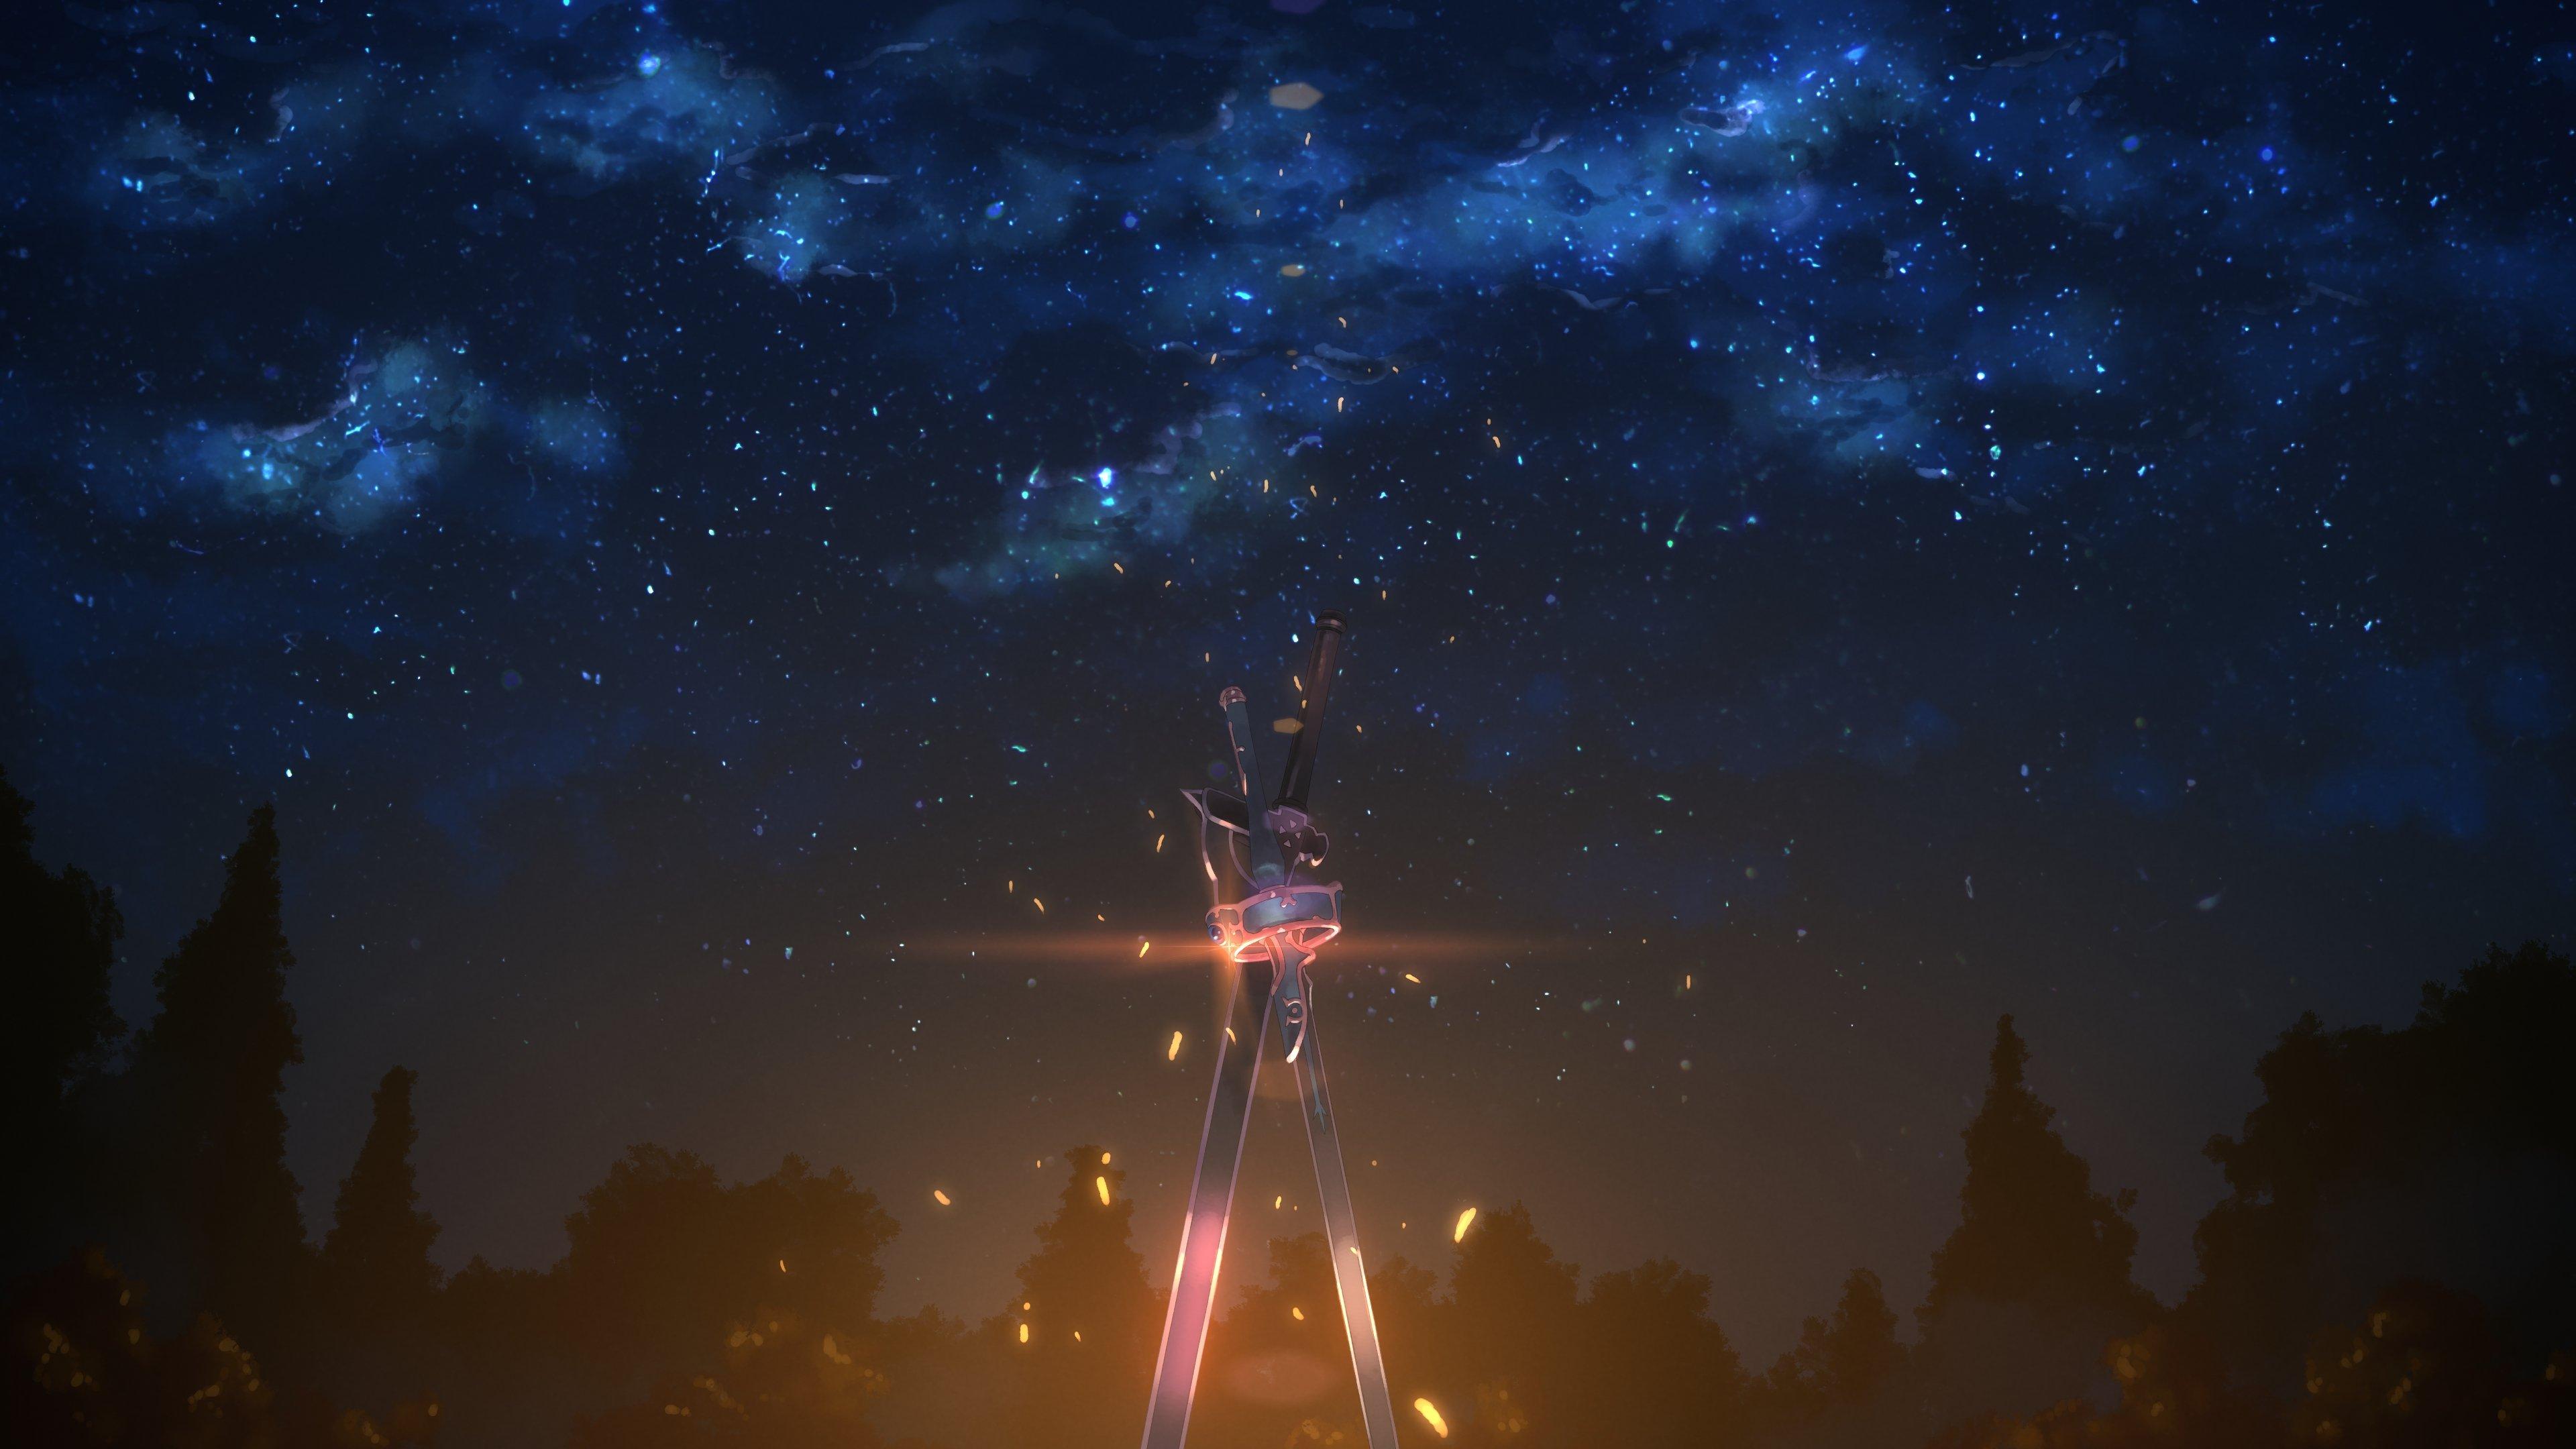 Wallpaper Kirito and Asuna's sword